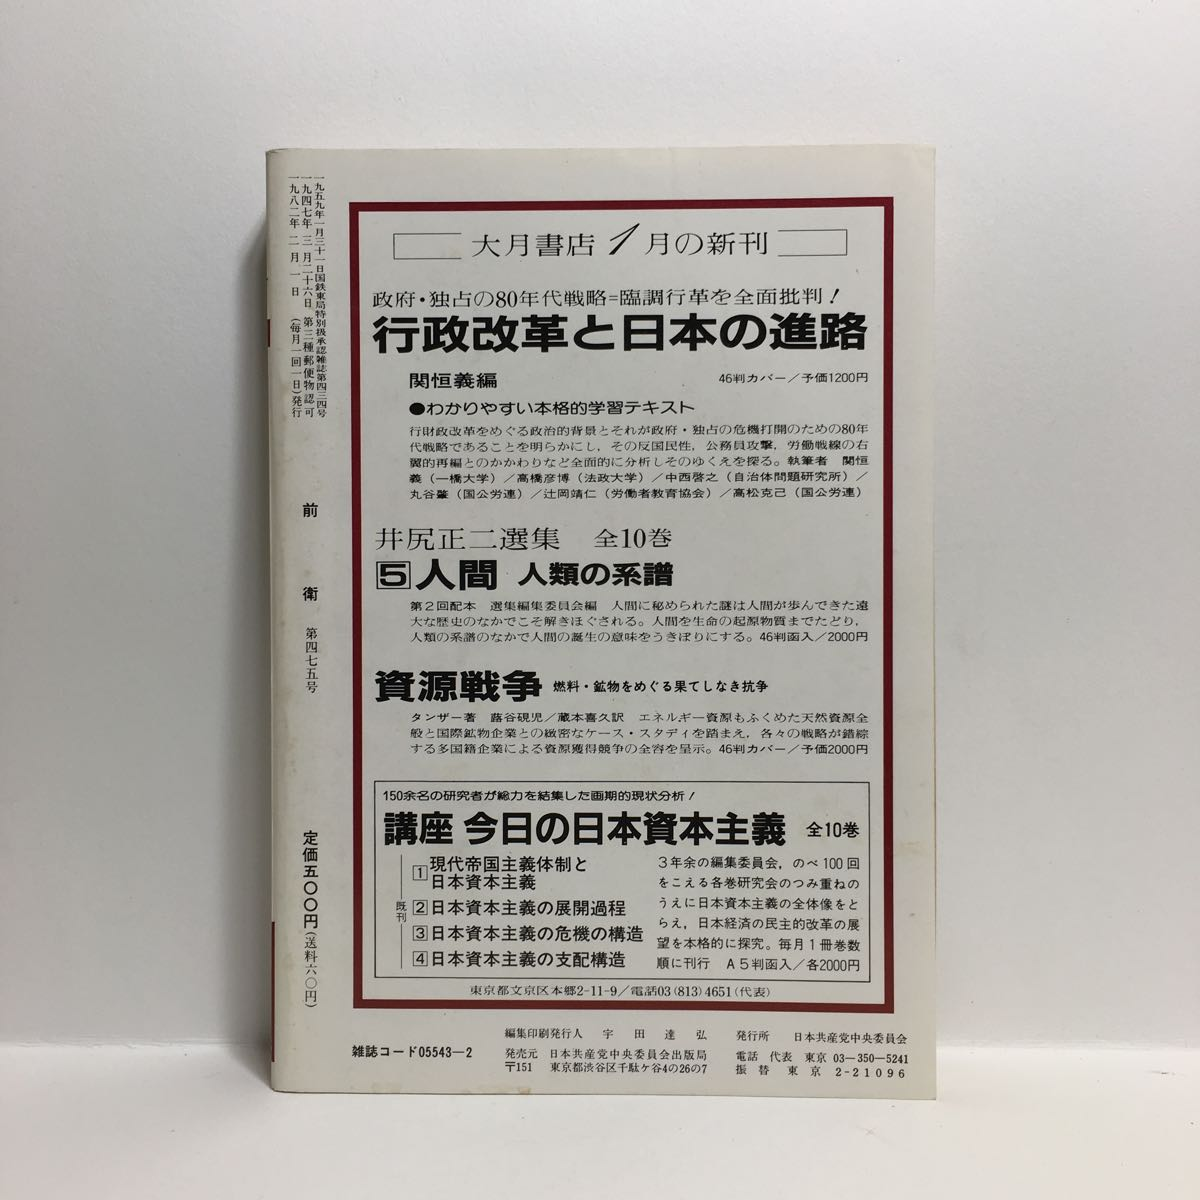 b1/前衛 No.475 1982.2 特集 社会主義の原点 日本共産党中央委員会理論政治誌 ゆうメール送料180円_画像3